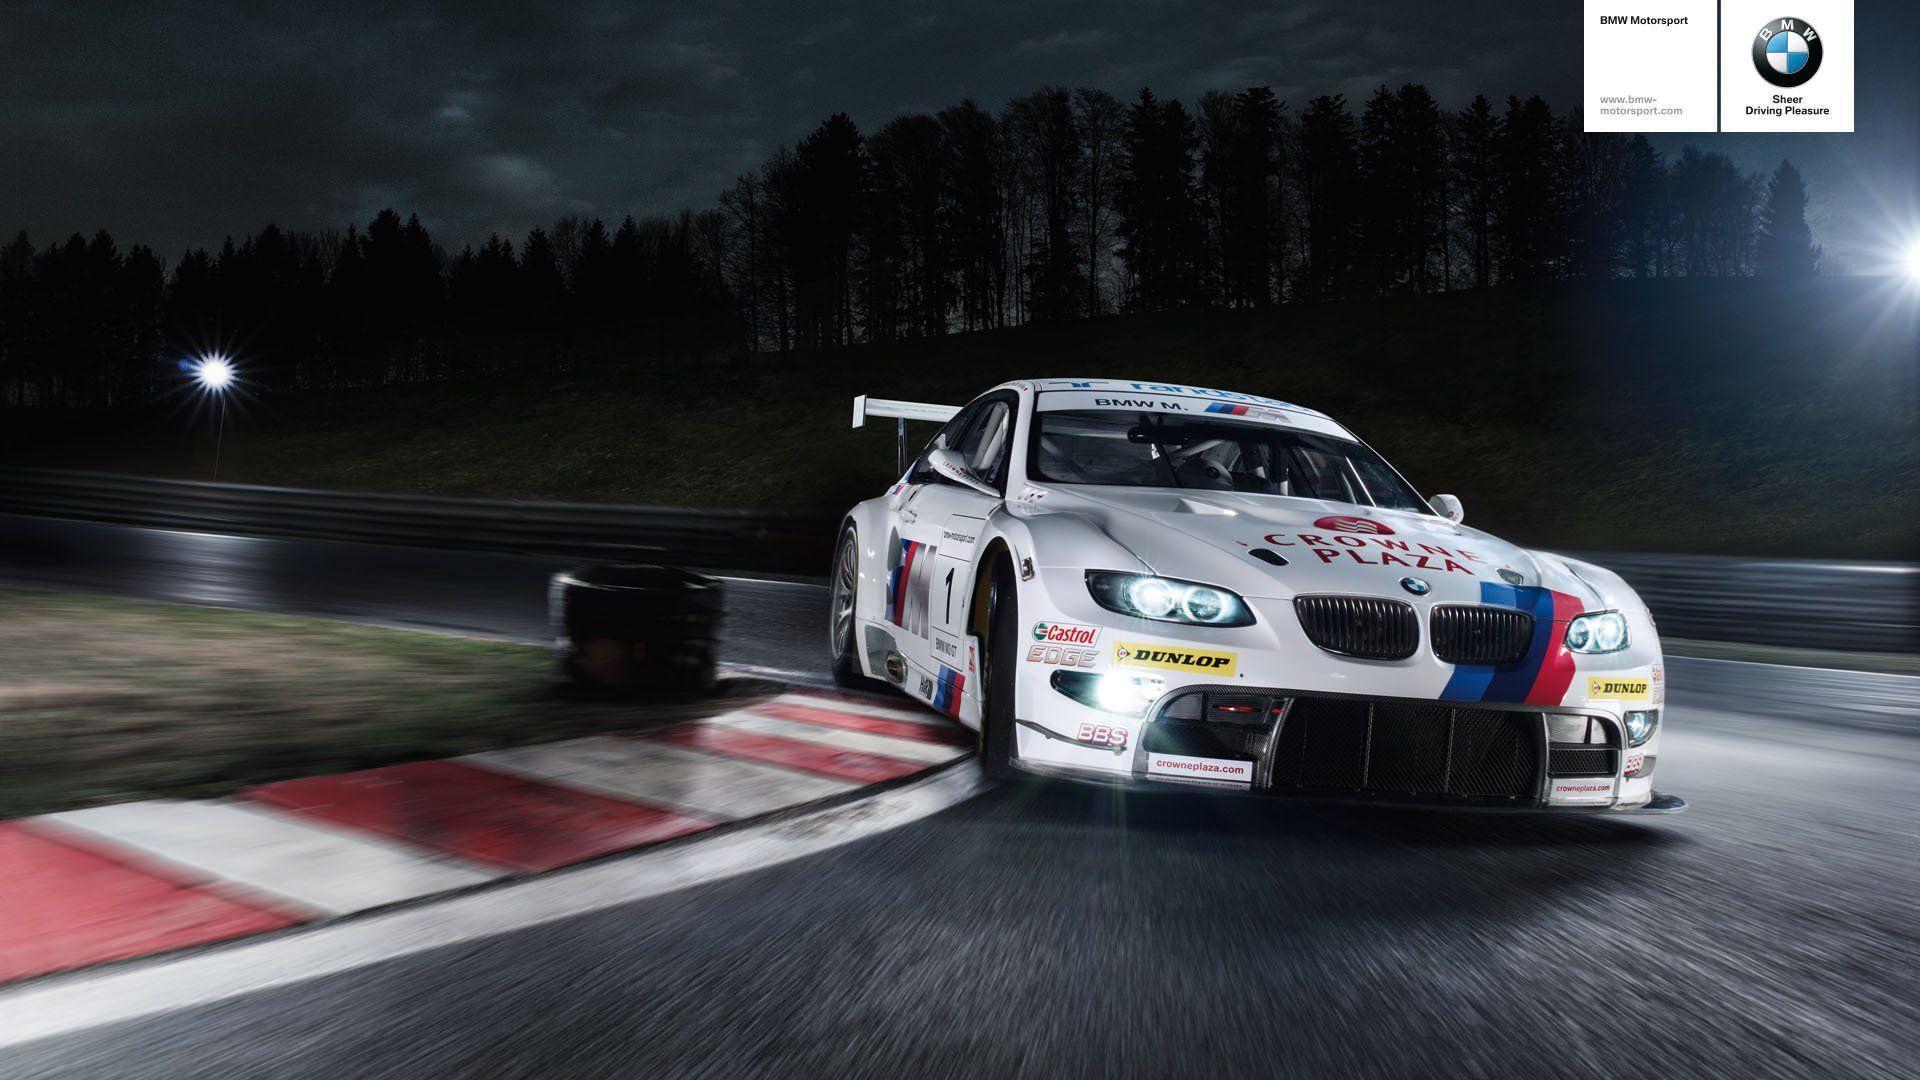 Top Free Motorsport Backgrounds